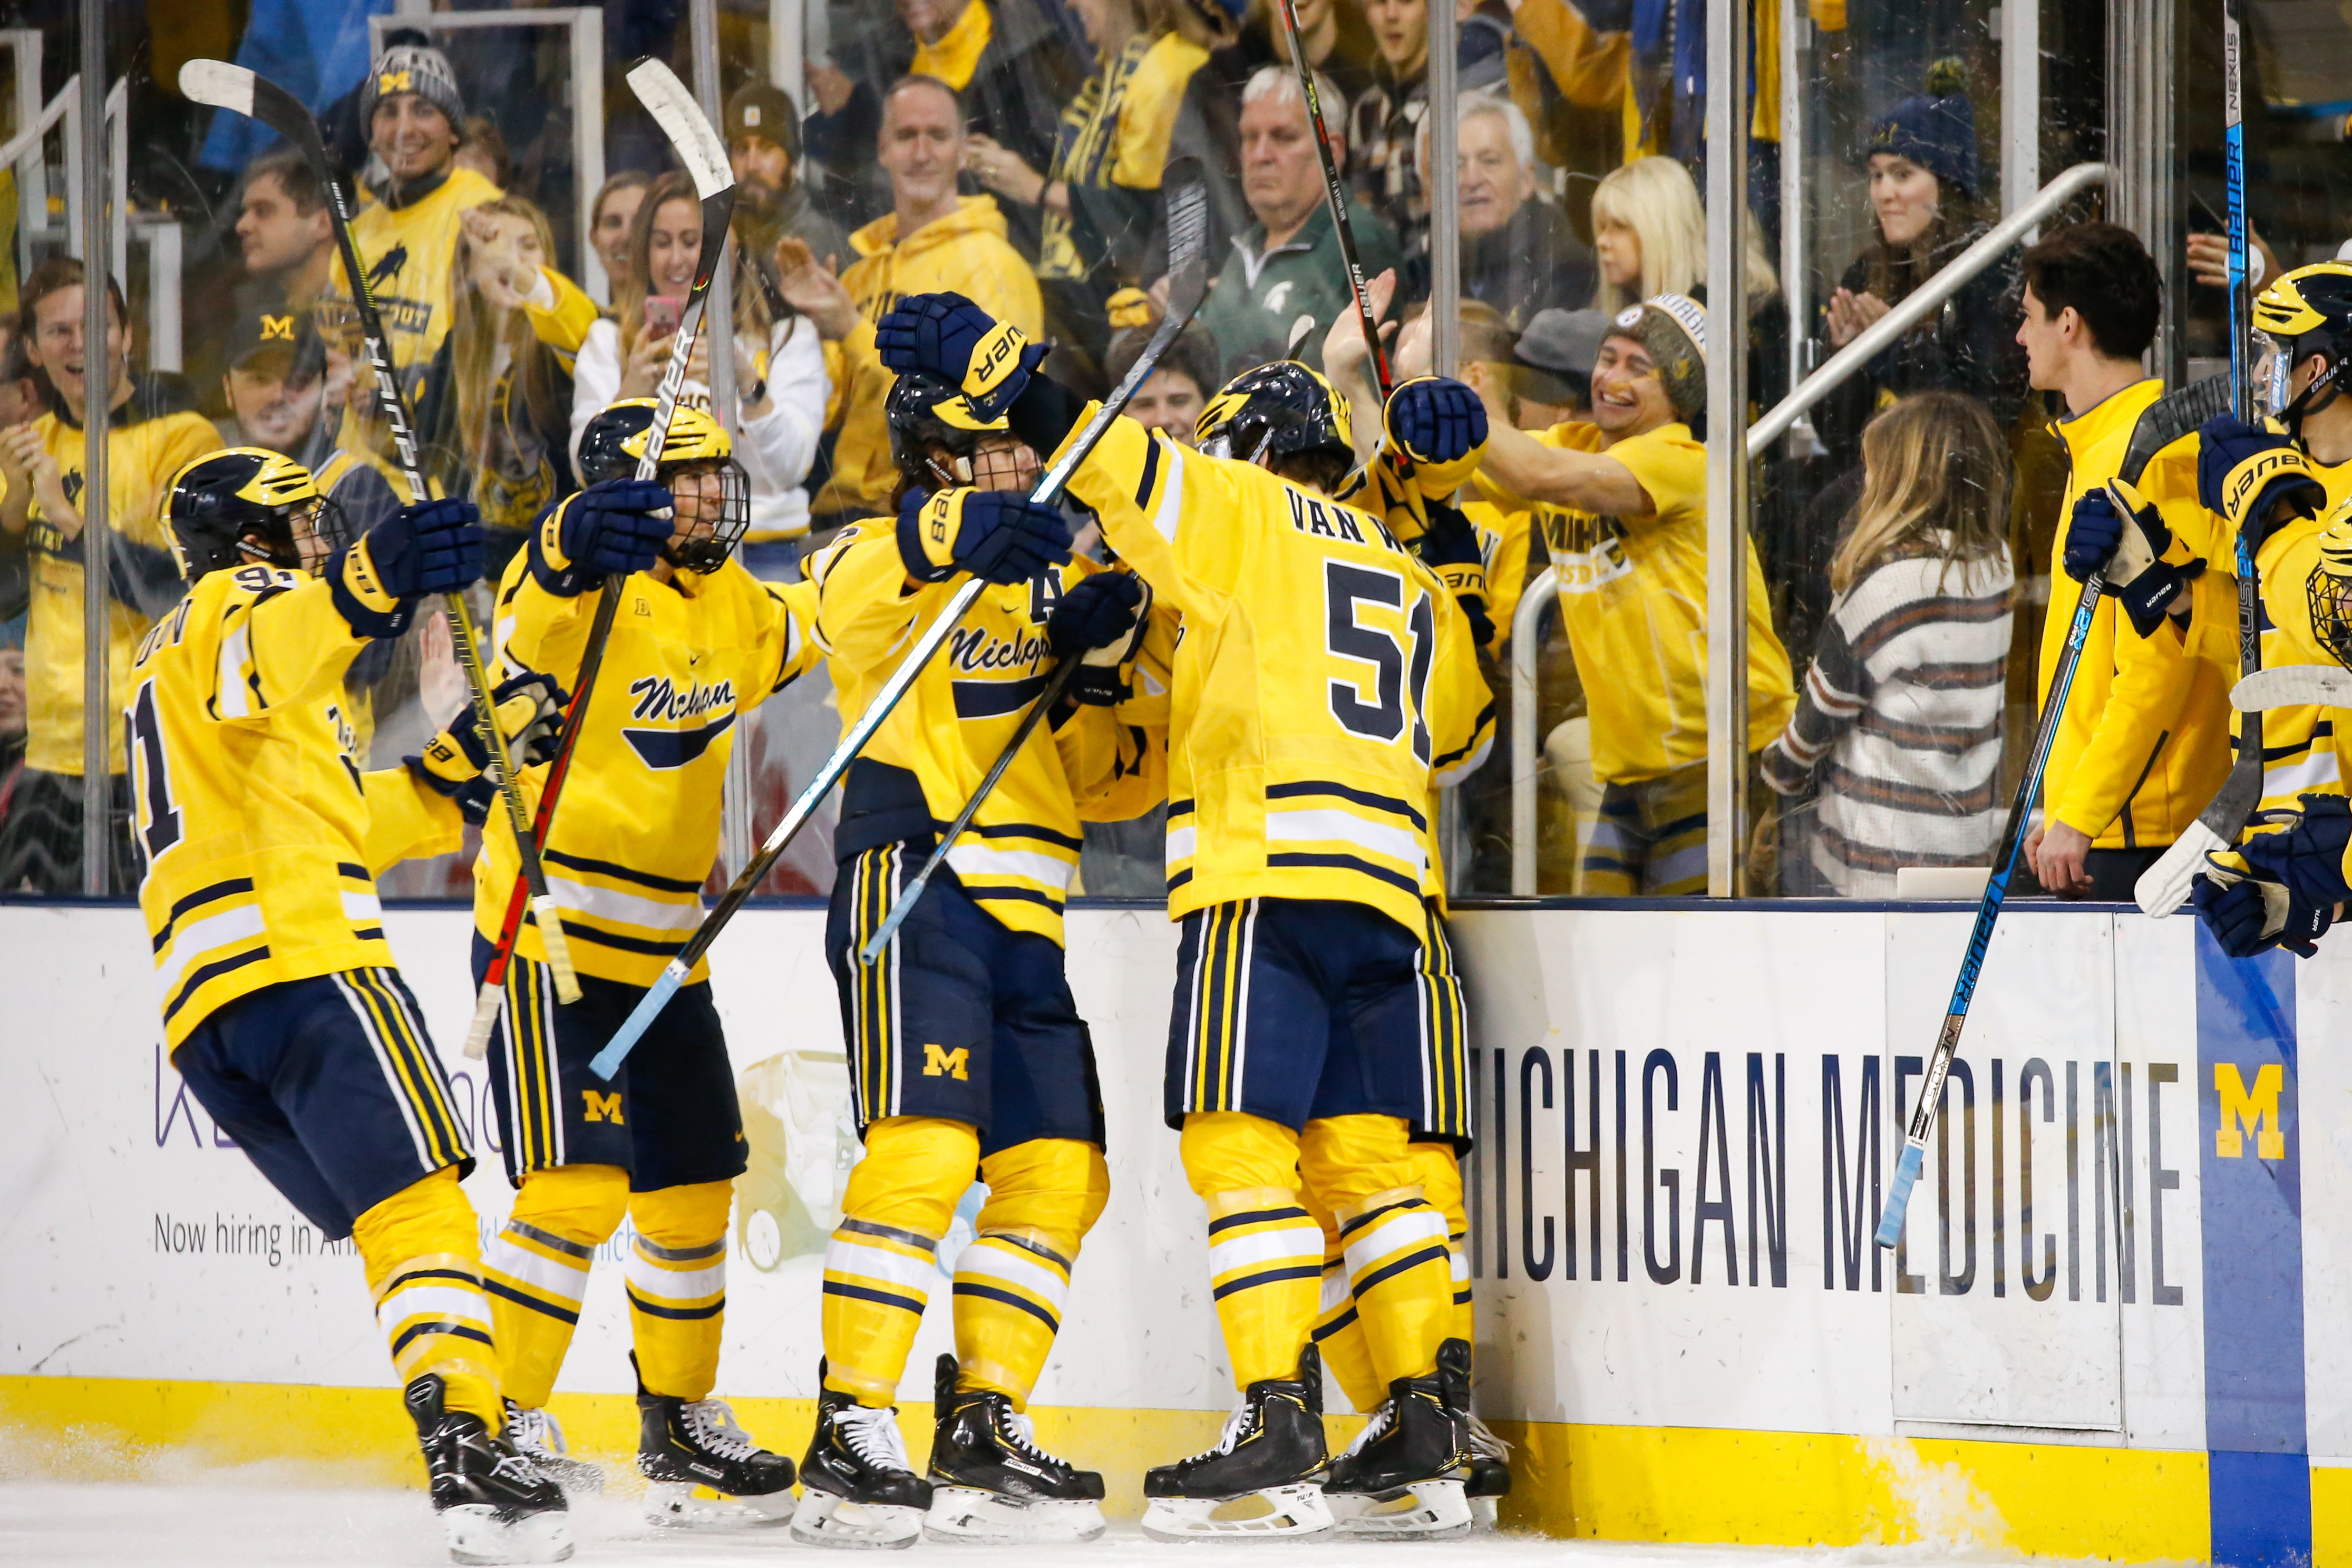 COLLEGE HOCKEY: NOV 14 Michigan State at Michigan